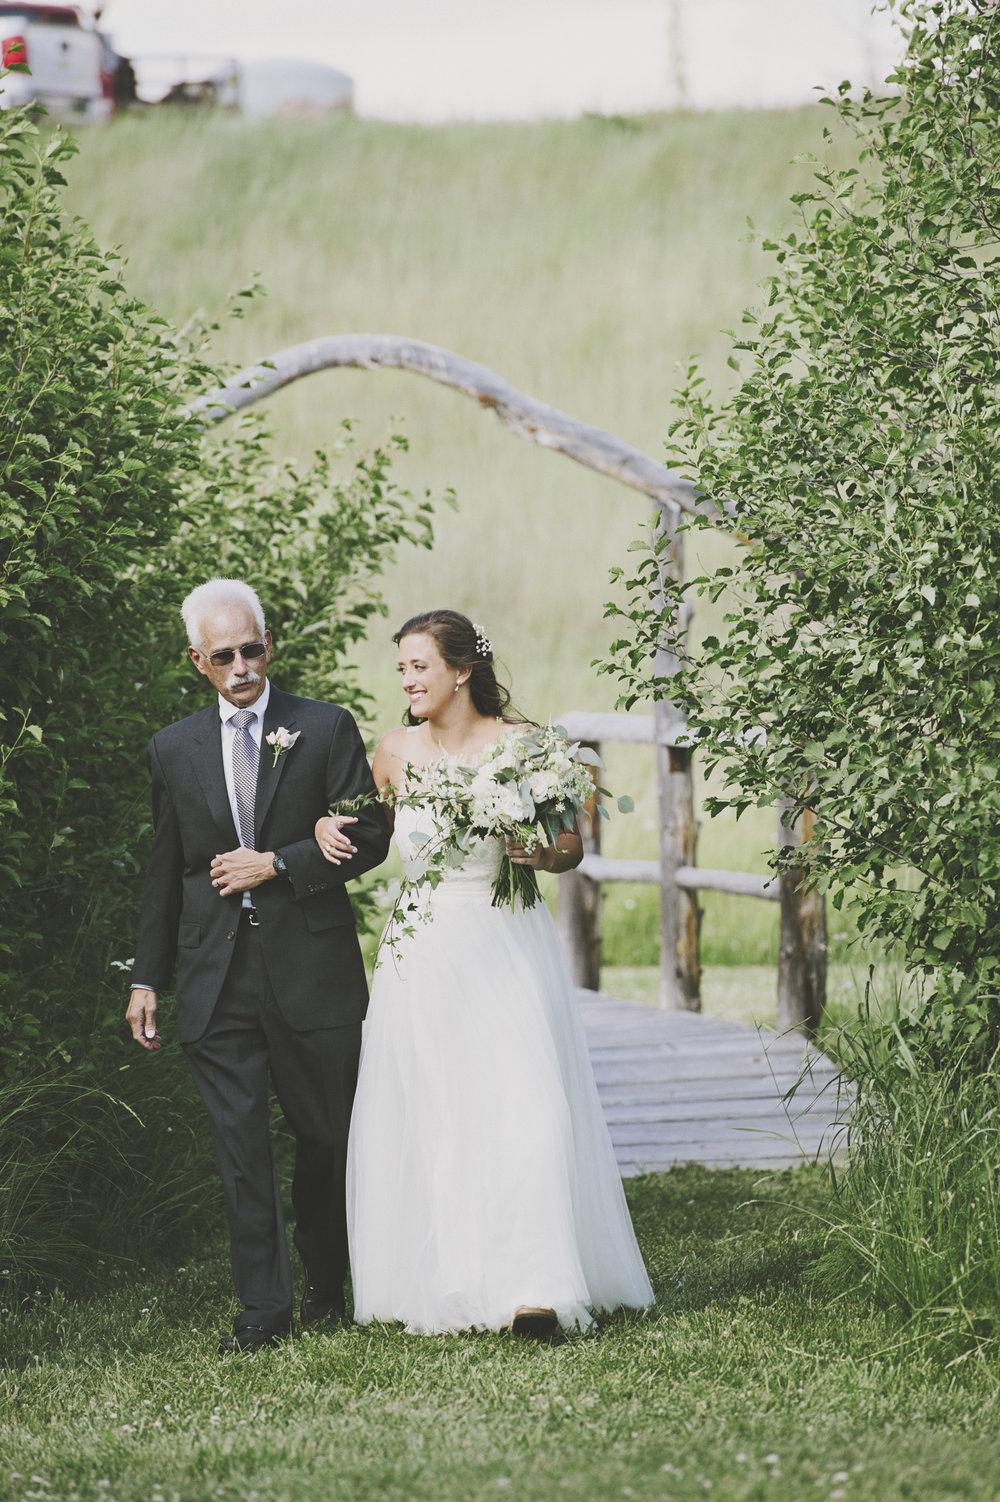 Chloe Hurwitz + Kiefer Martin Wedding_Grey Wolf Ranch_Kelsey Lane Photography1580 copy.jpg